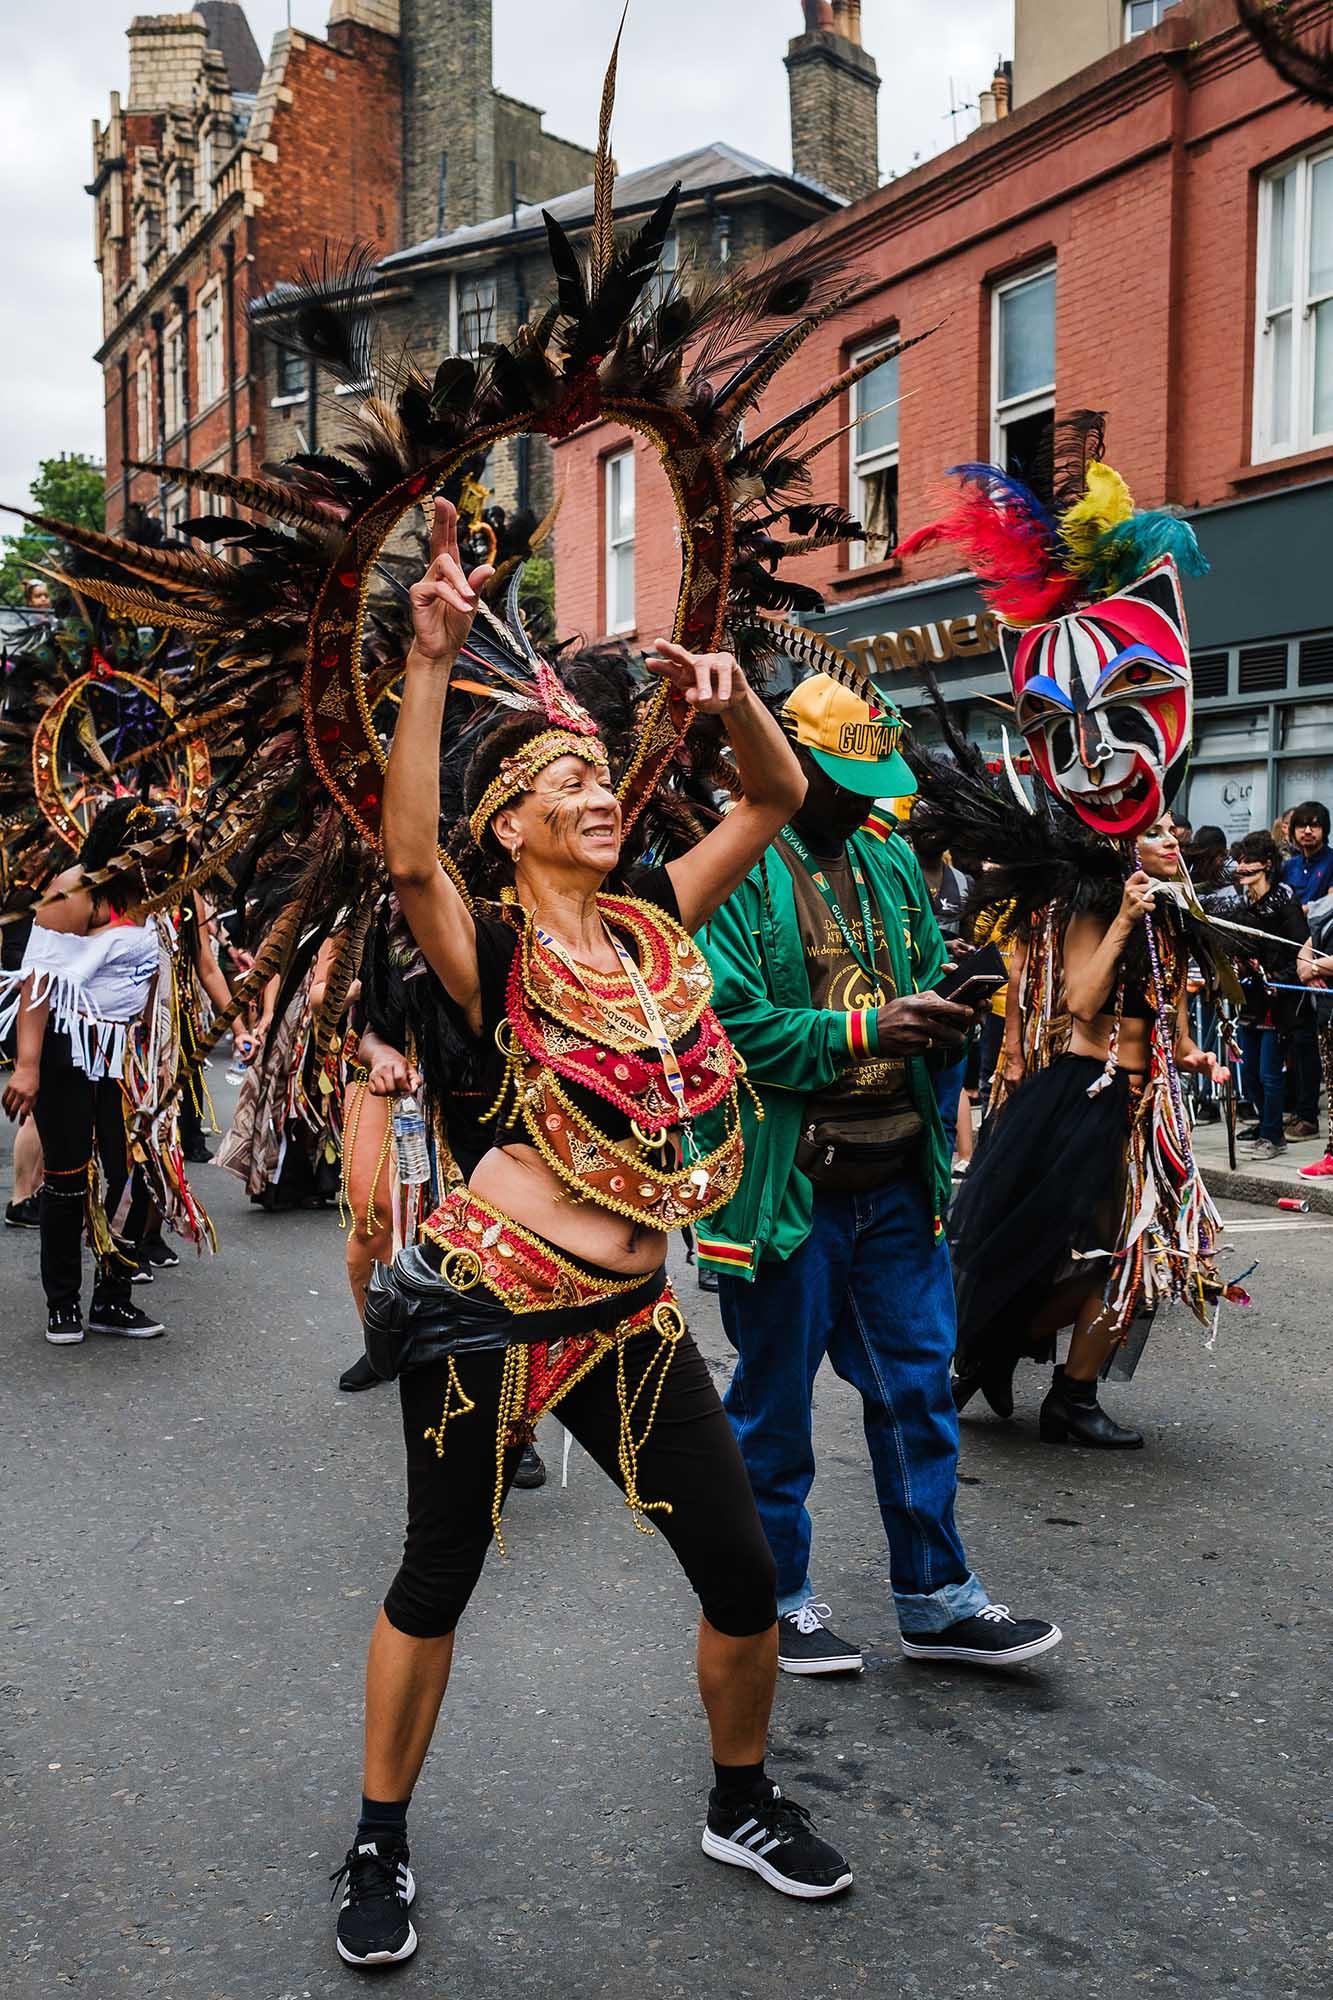 Soca music, carnival, Caribbean